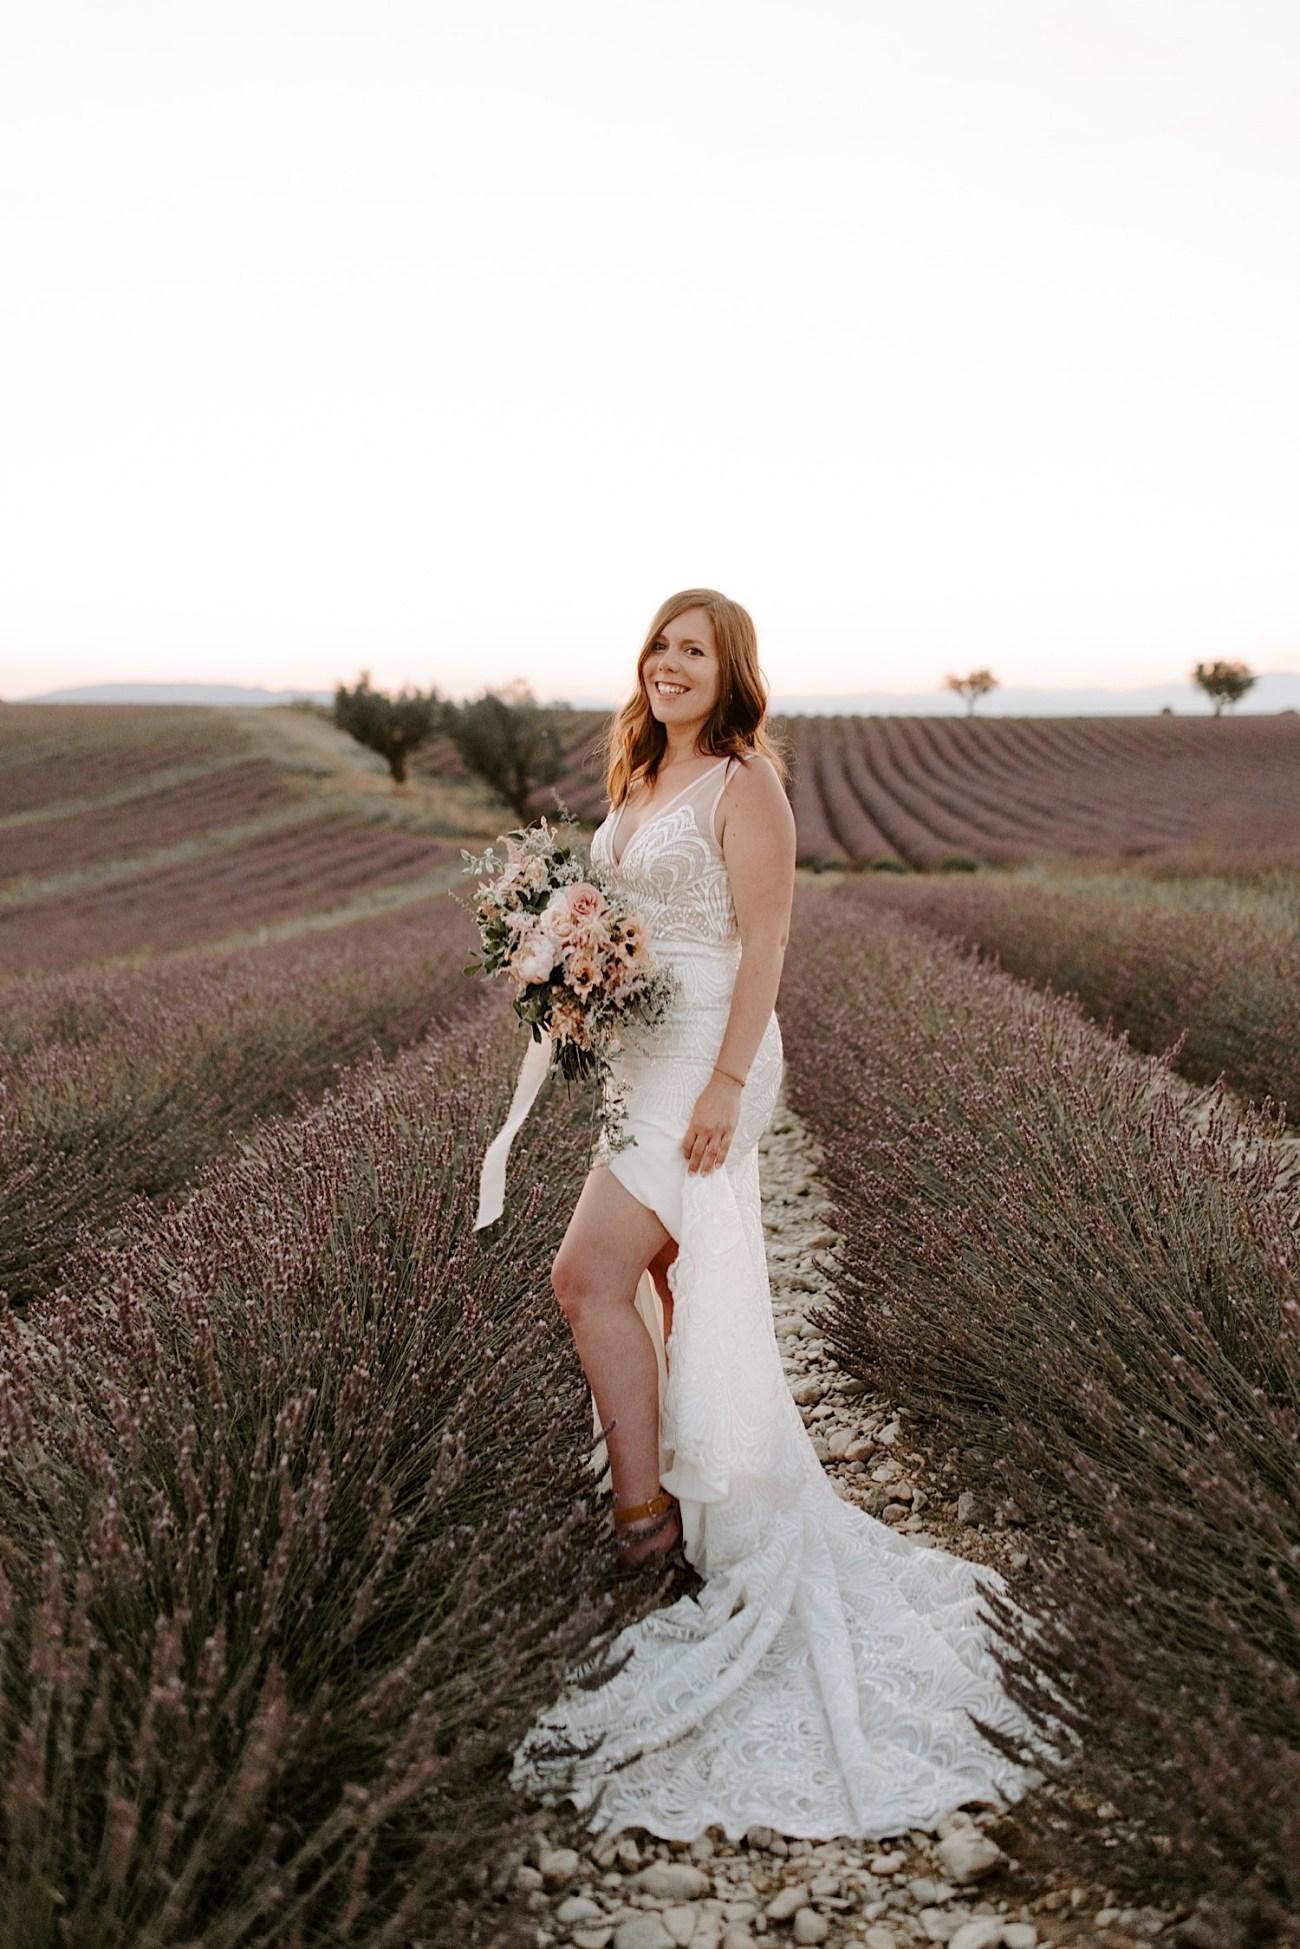 Valensole Wedding Photos Lavender Field Wedding Provence Wedding French Wedding Photographer Destination Wedding France Anais Possamai Photography 09